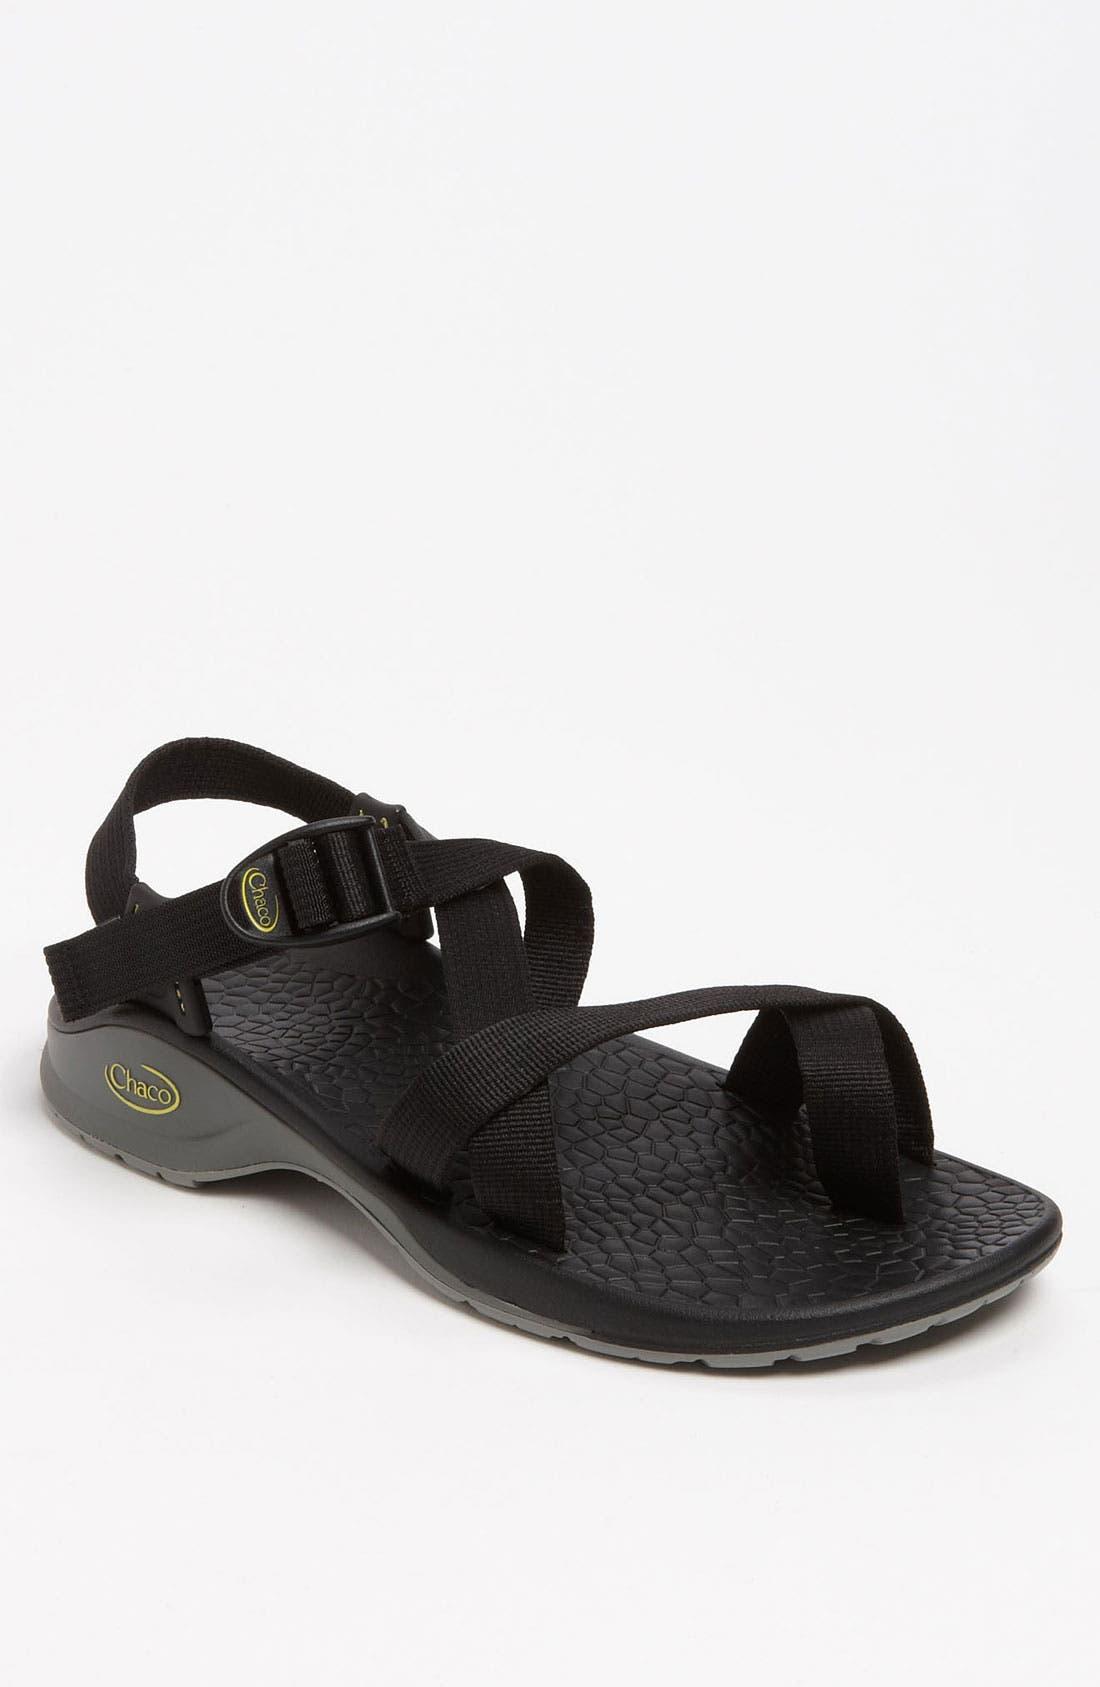 Main Image - Chaco 'Updraft 2' Sandal